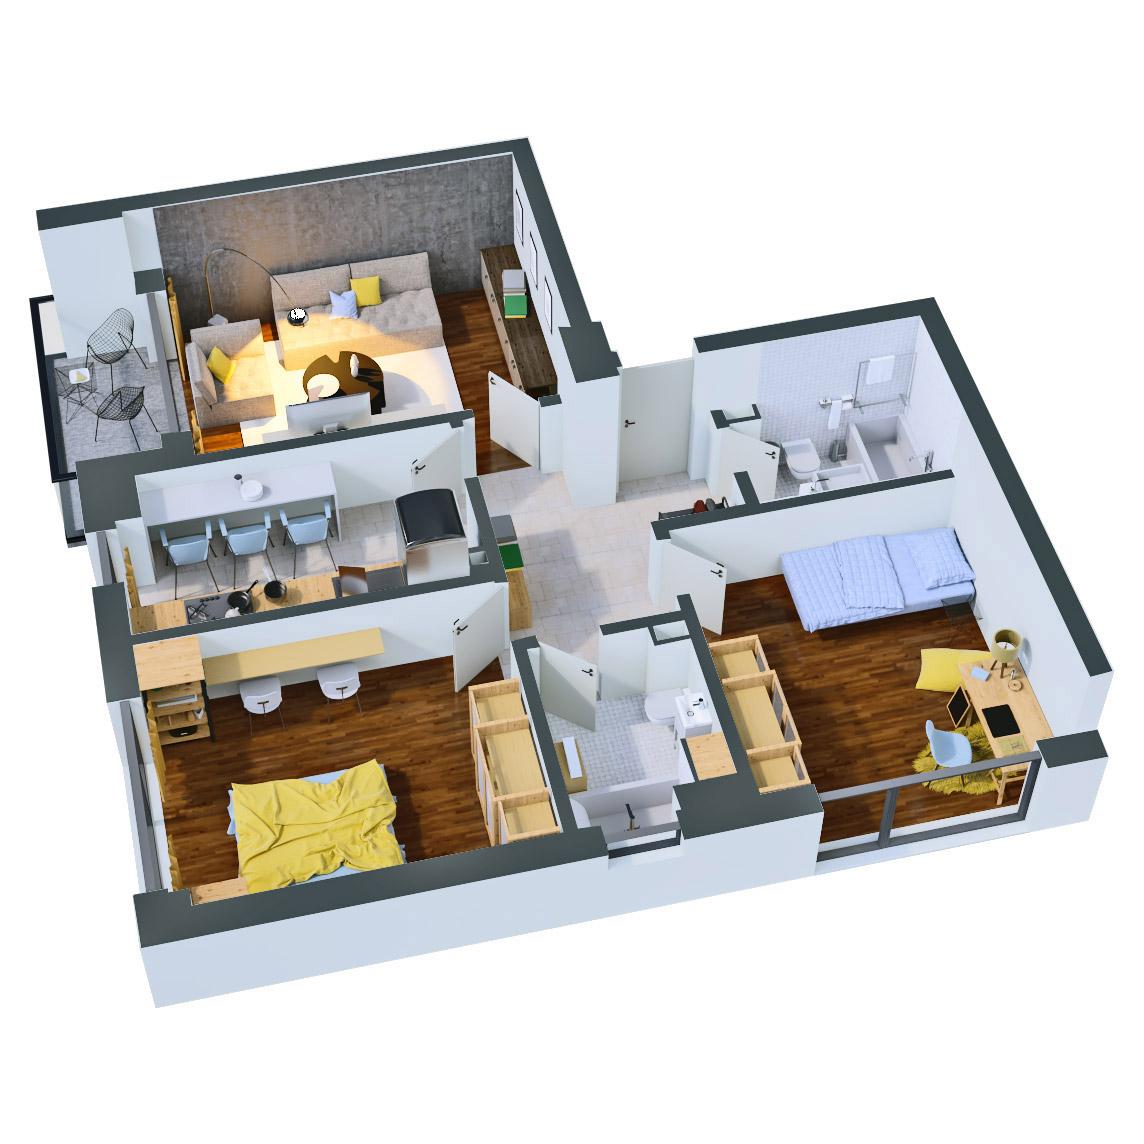 Apartament 3 camere de vanzare Bucuresti - Catedral Residence - Marriott, Piata Unirii, 13 Septembrie, Izvor - Tip 1 - T2A - B